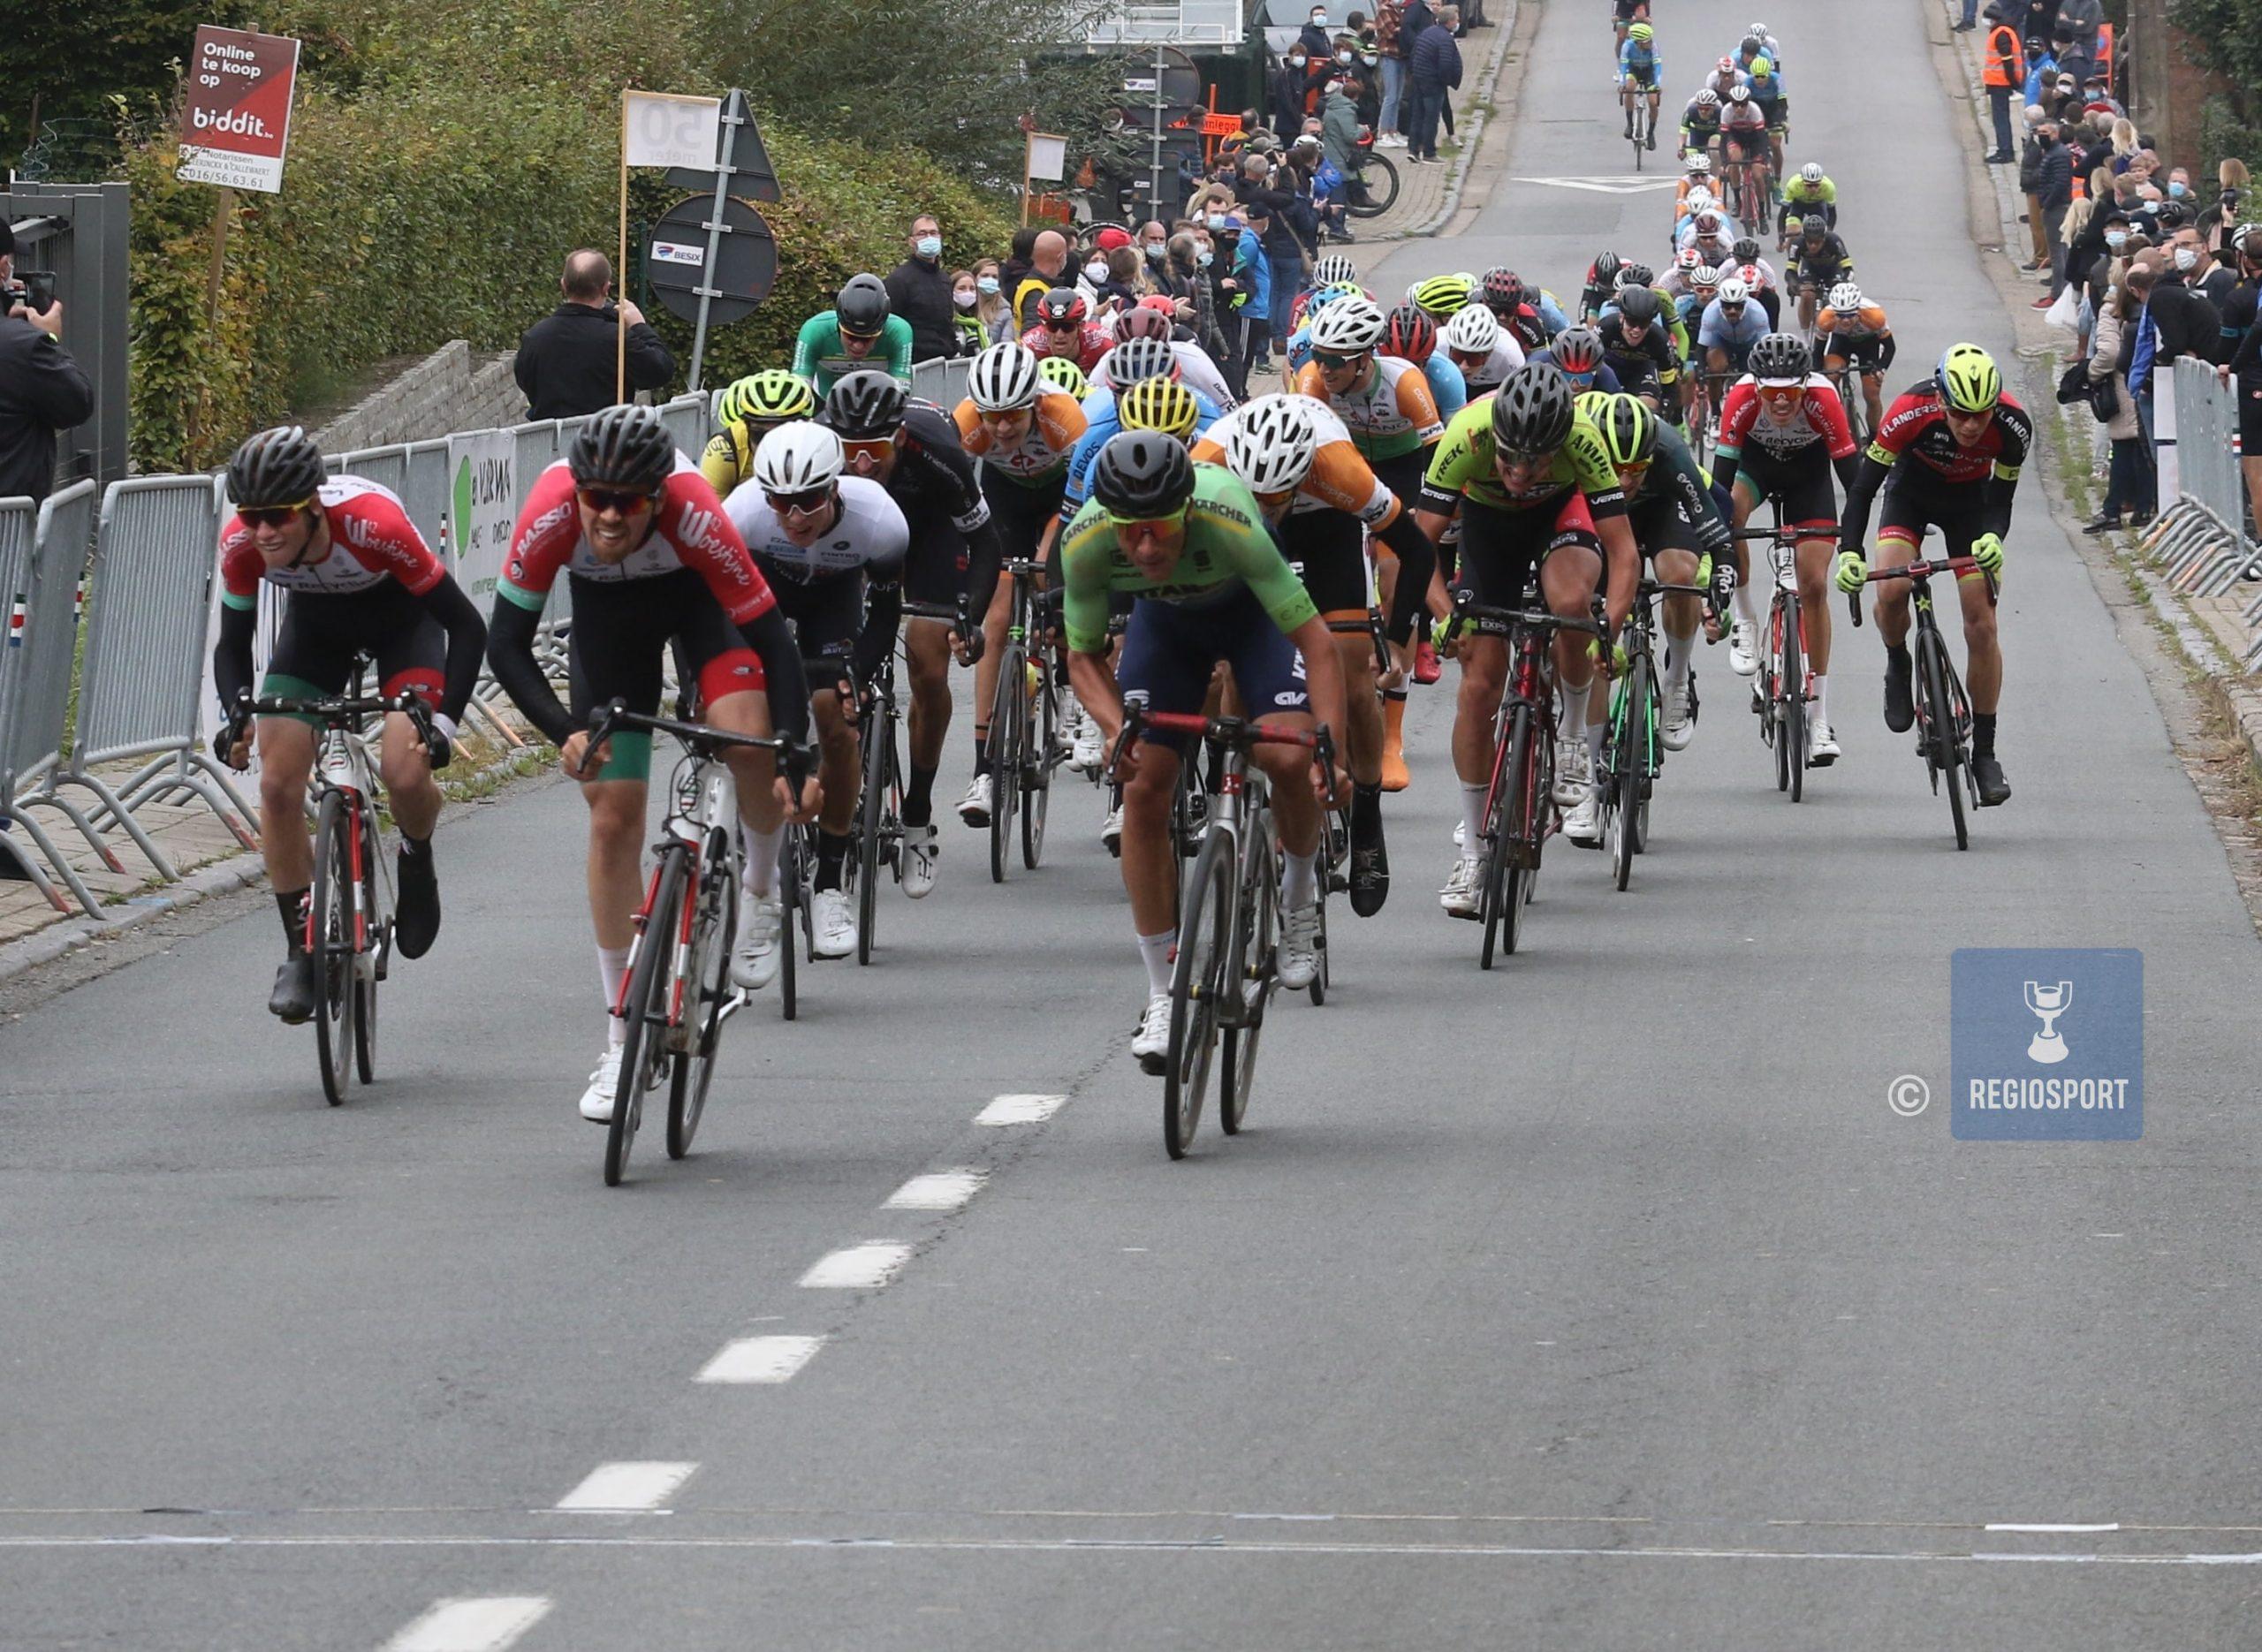 Basso Team Flanders mag ter elfder ure niet starten in Franse driedaagse, renner Simon Dehairs reageert